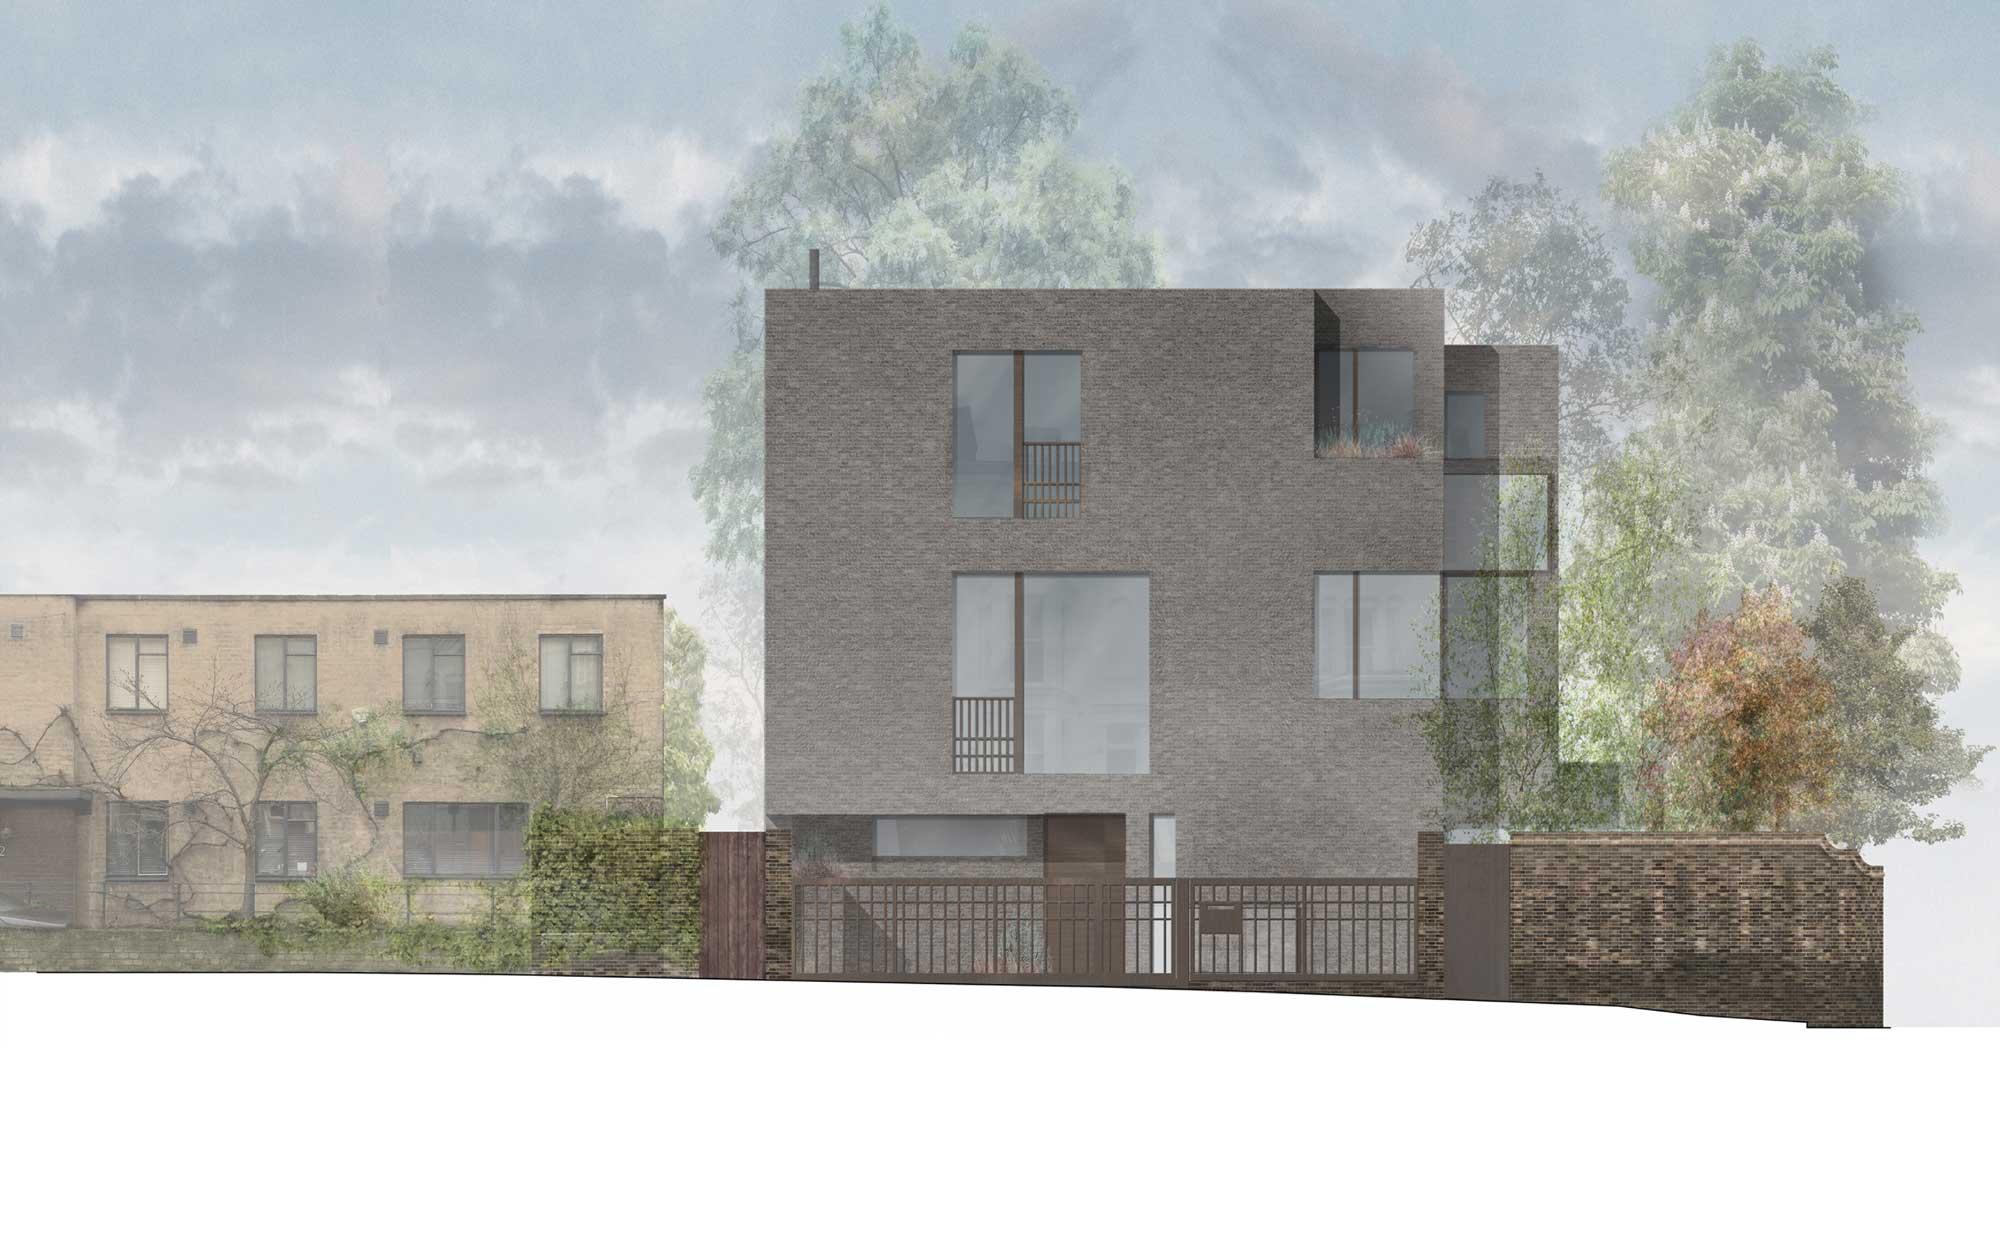 kensington-house-openstudio-architects-elevation-view